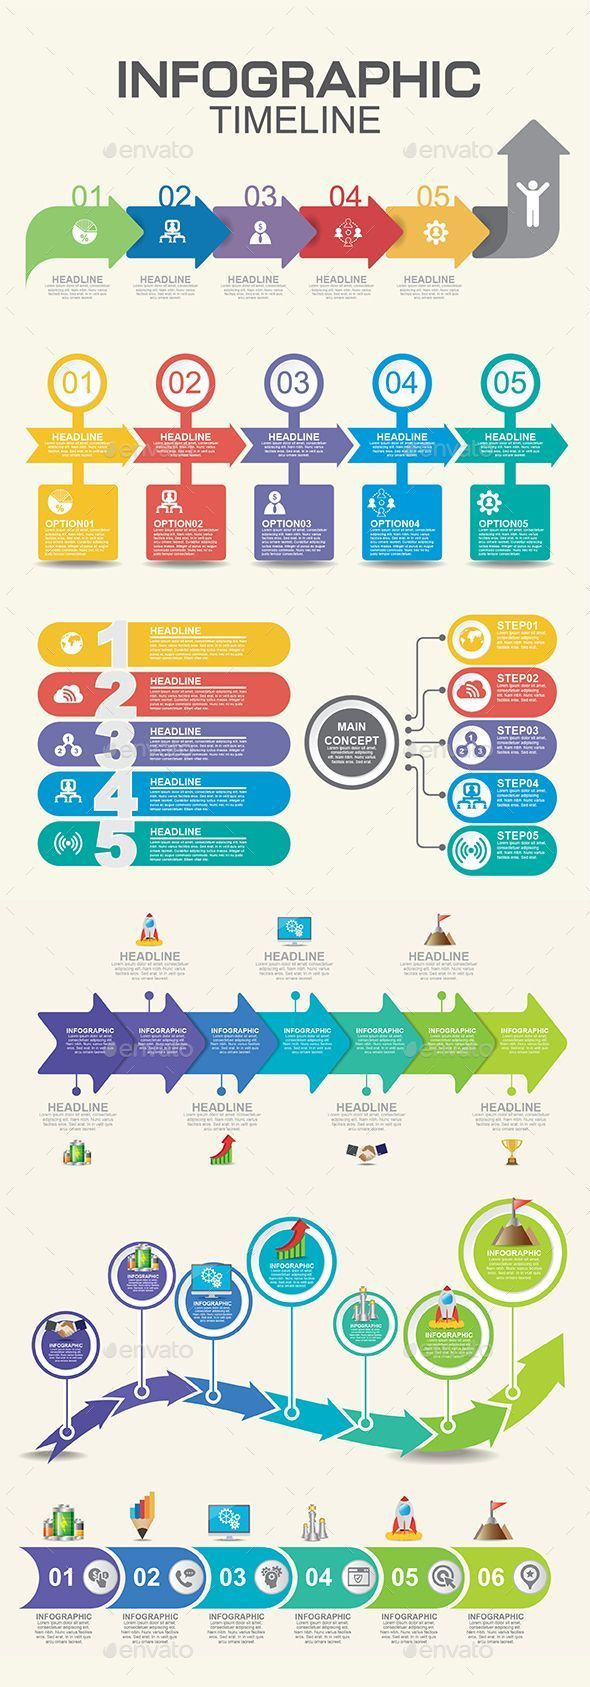 Timeline Infographic Infographics InfographicsIcons